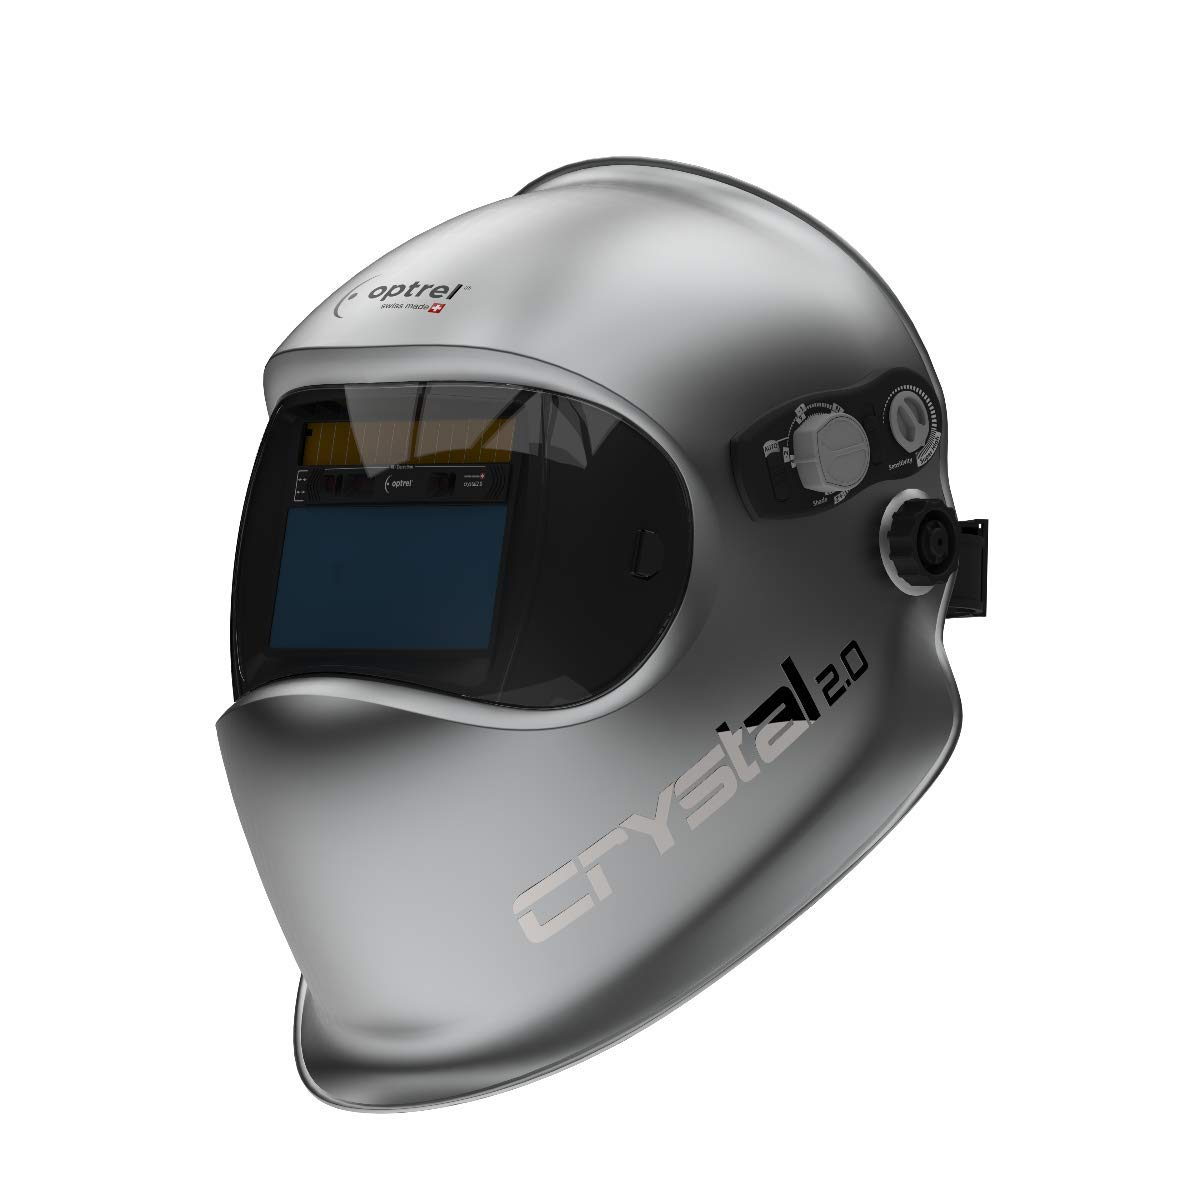 Optrel Crystal 2.0 Auto-Darkening Welding Helmet 1006.900 by Optrel